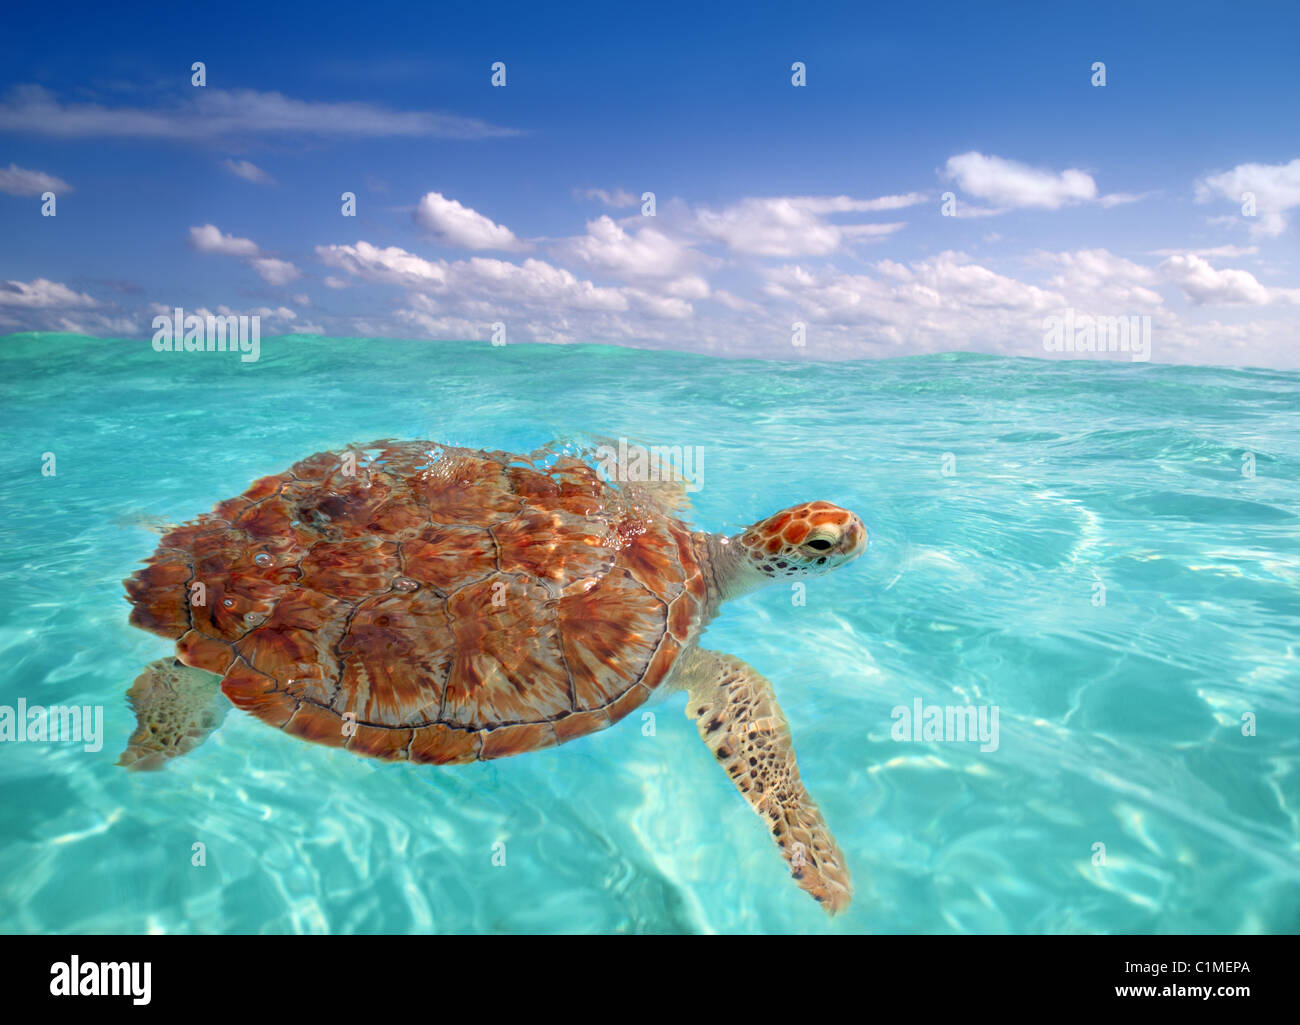 Mar Verde tartaruga Chelonia mydas mar do Caribe Cheloniidae a superfície da água Imagens de Stock